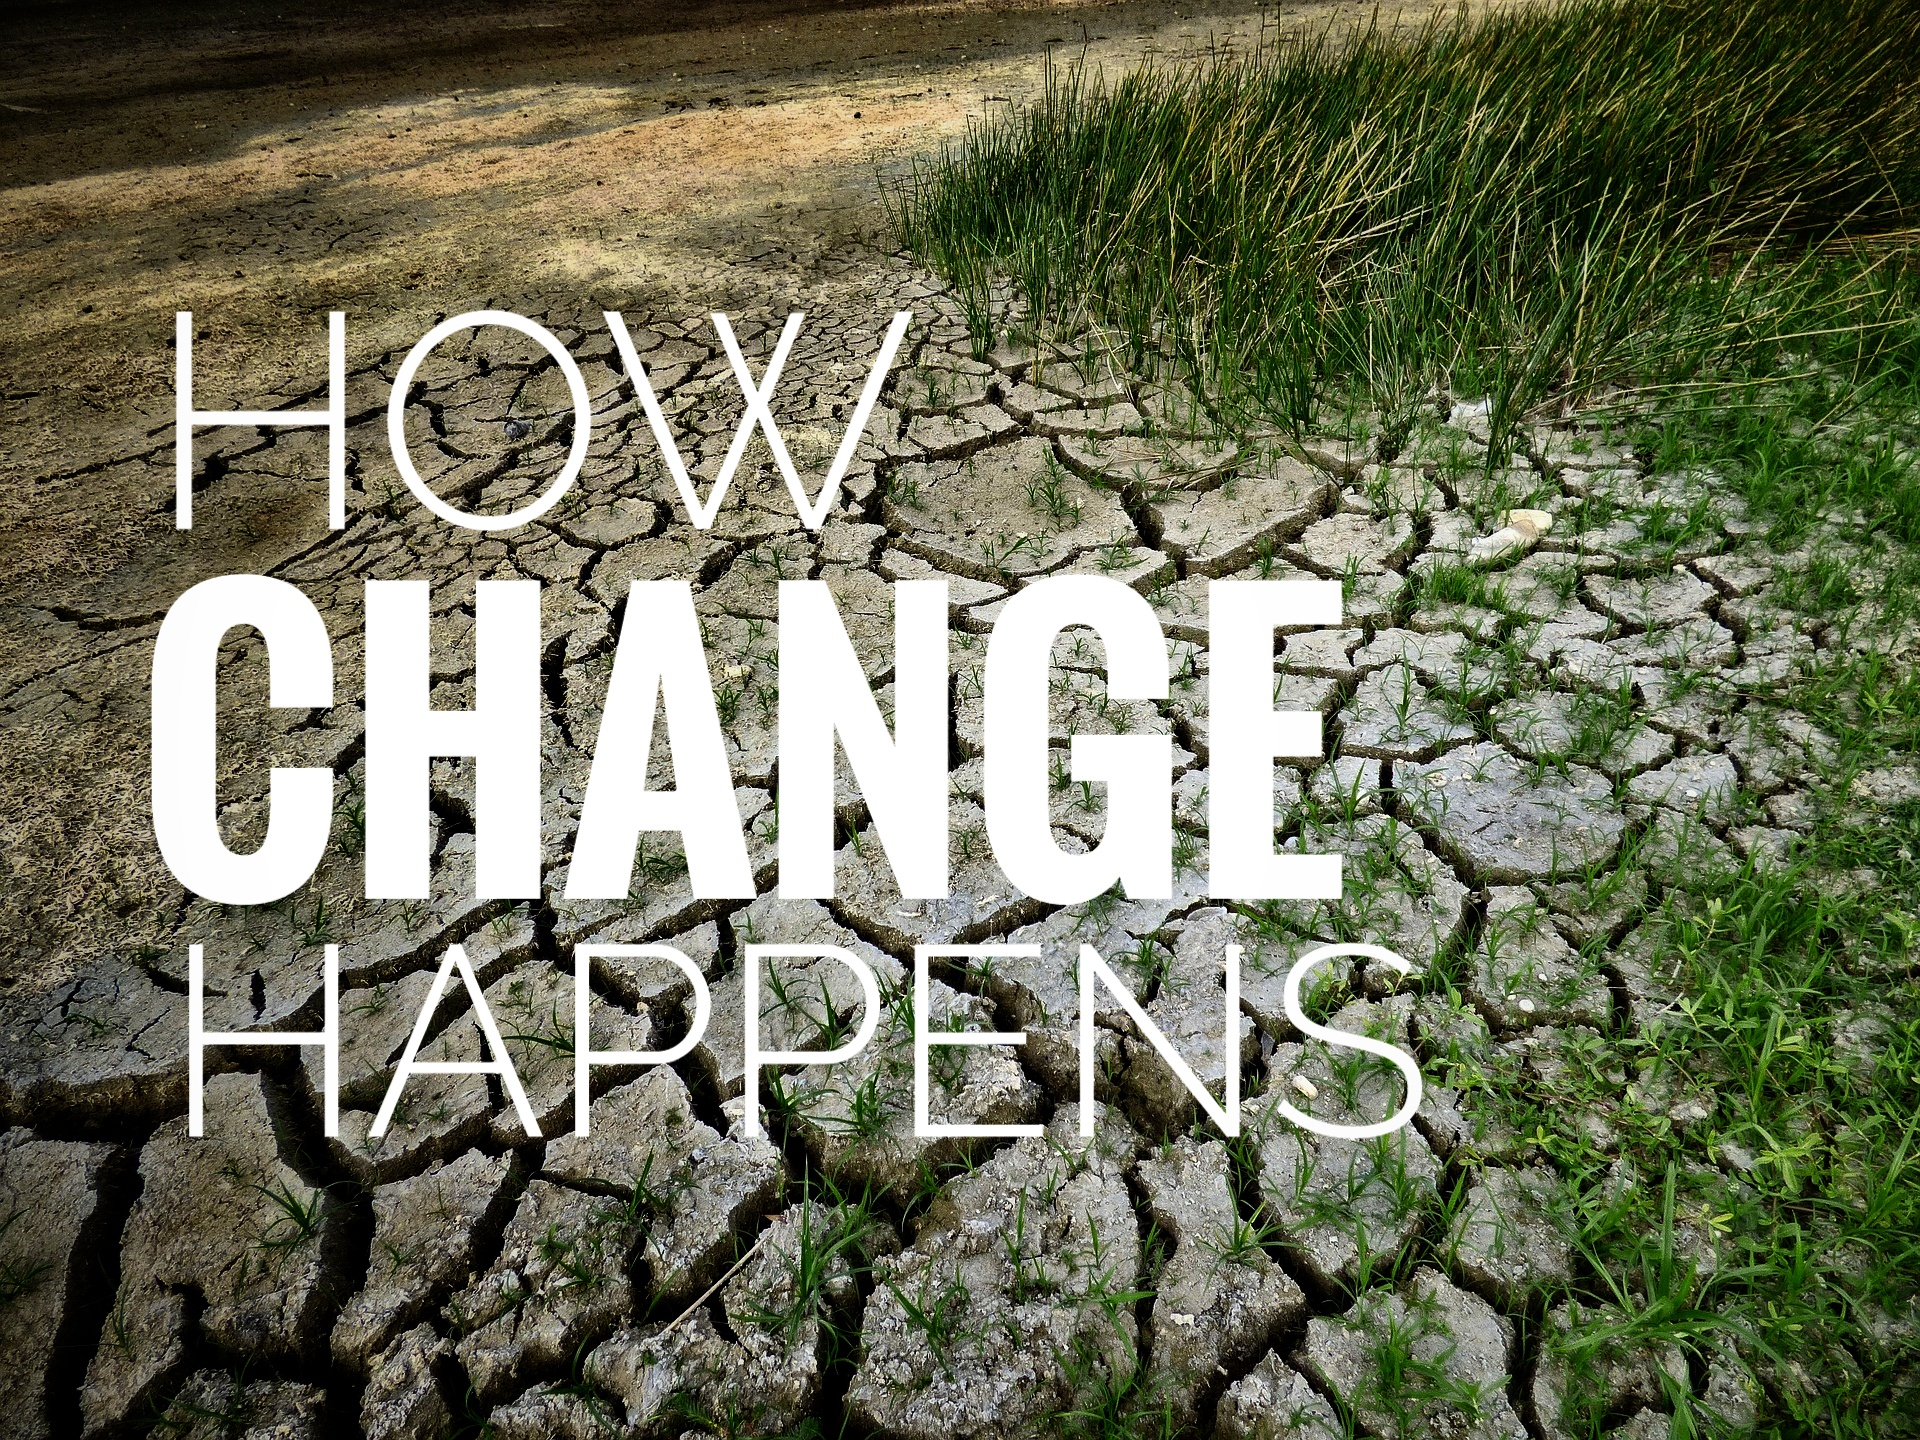 climate-change-2241061_1920-01.jpeg